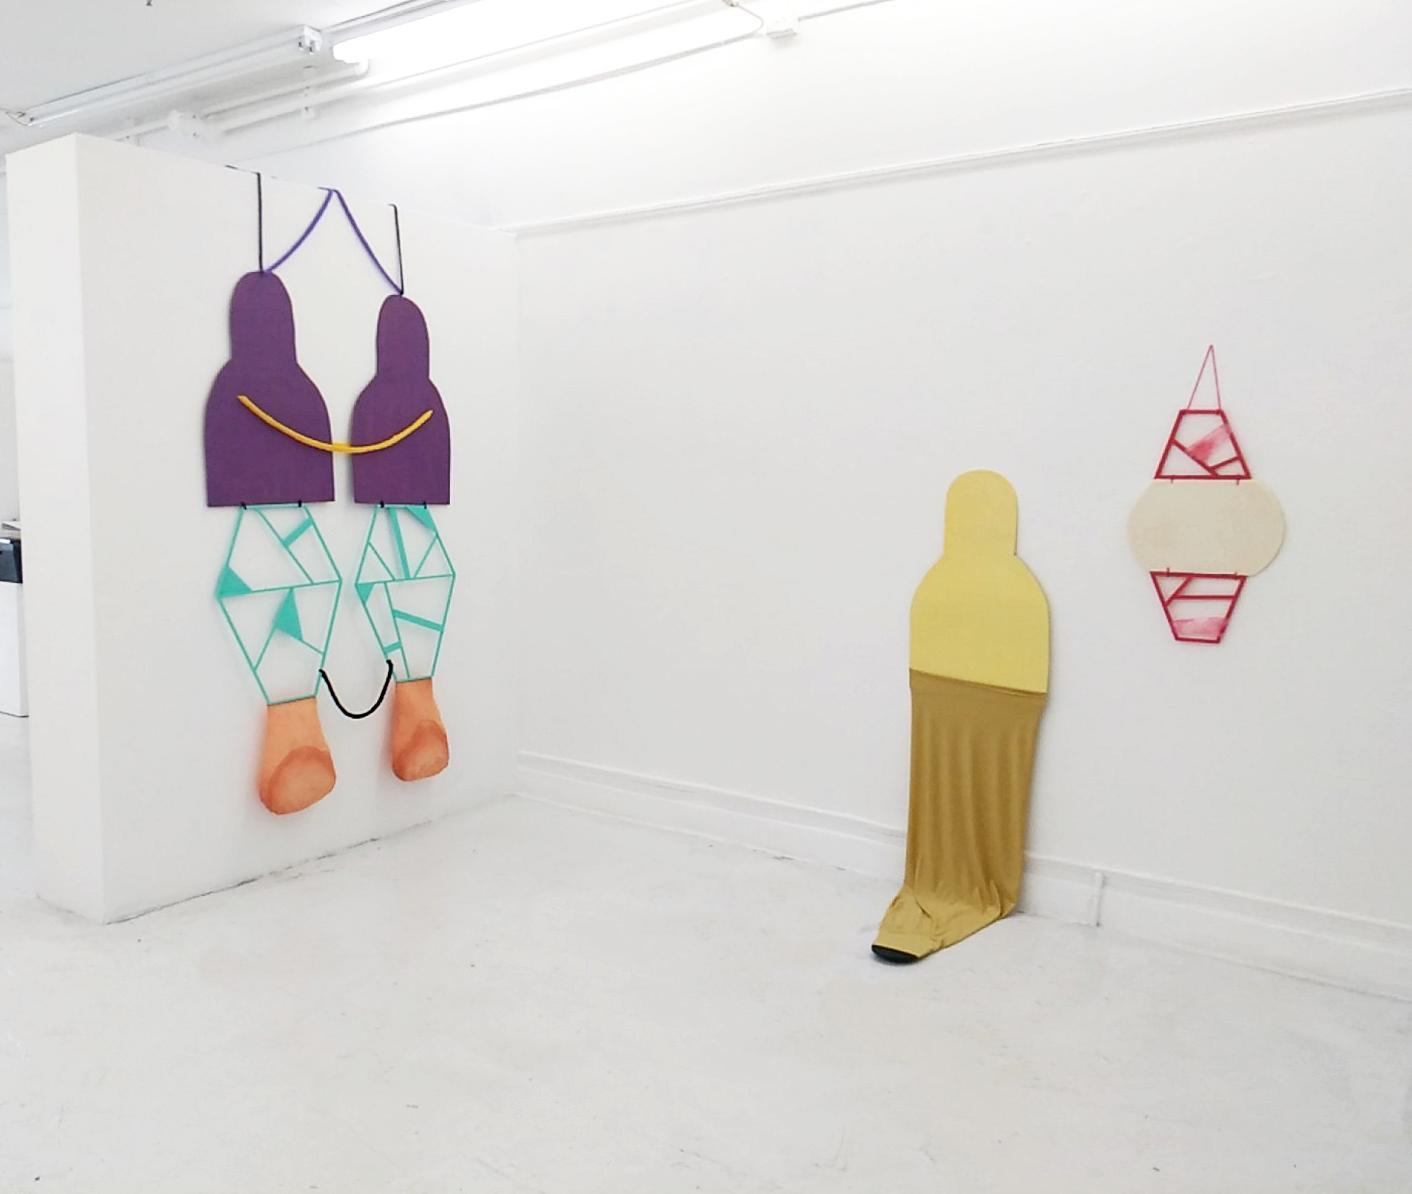 """Mirror self""  Yarn, wood, textile.  ""Lightbody""  Wood, textile.  ""Expanding in silence""  Wood, foam, textile, yarn. Swim Gallery. San Francisco. 2018"